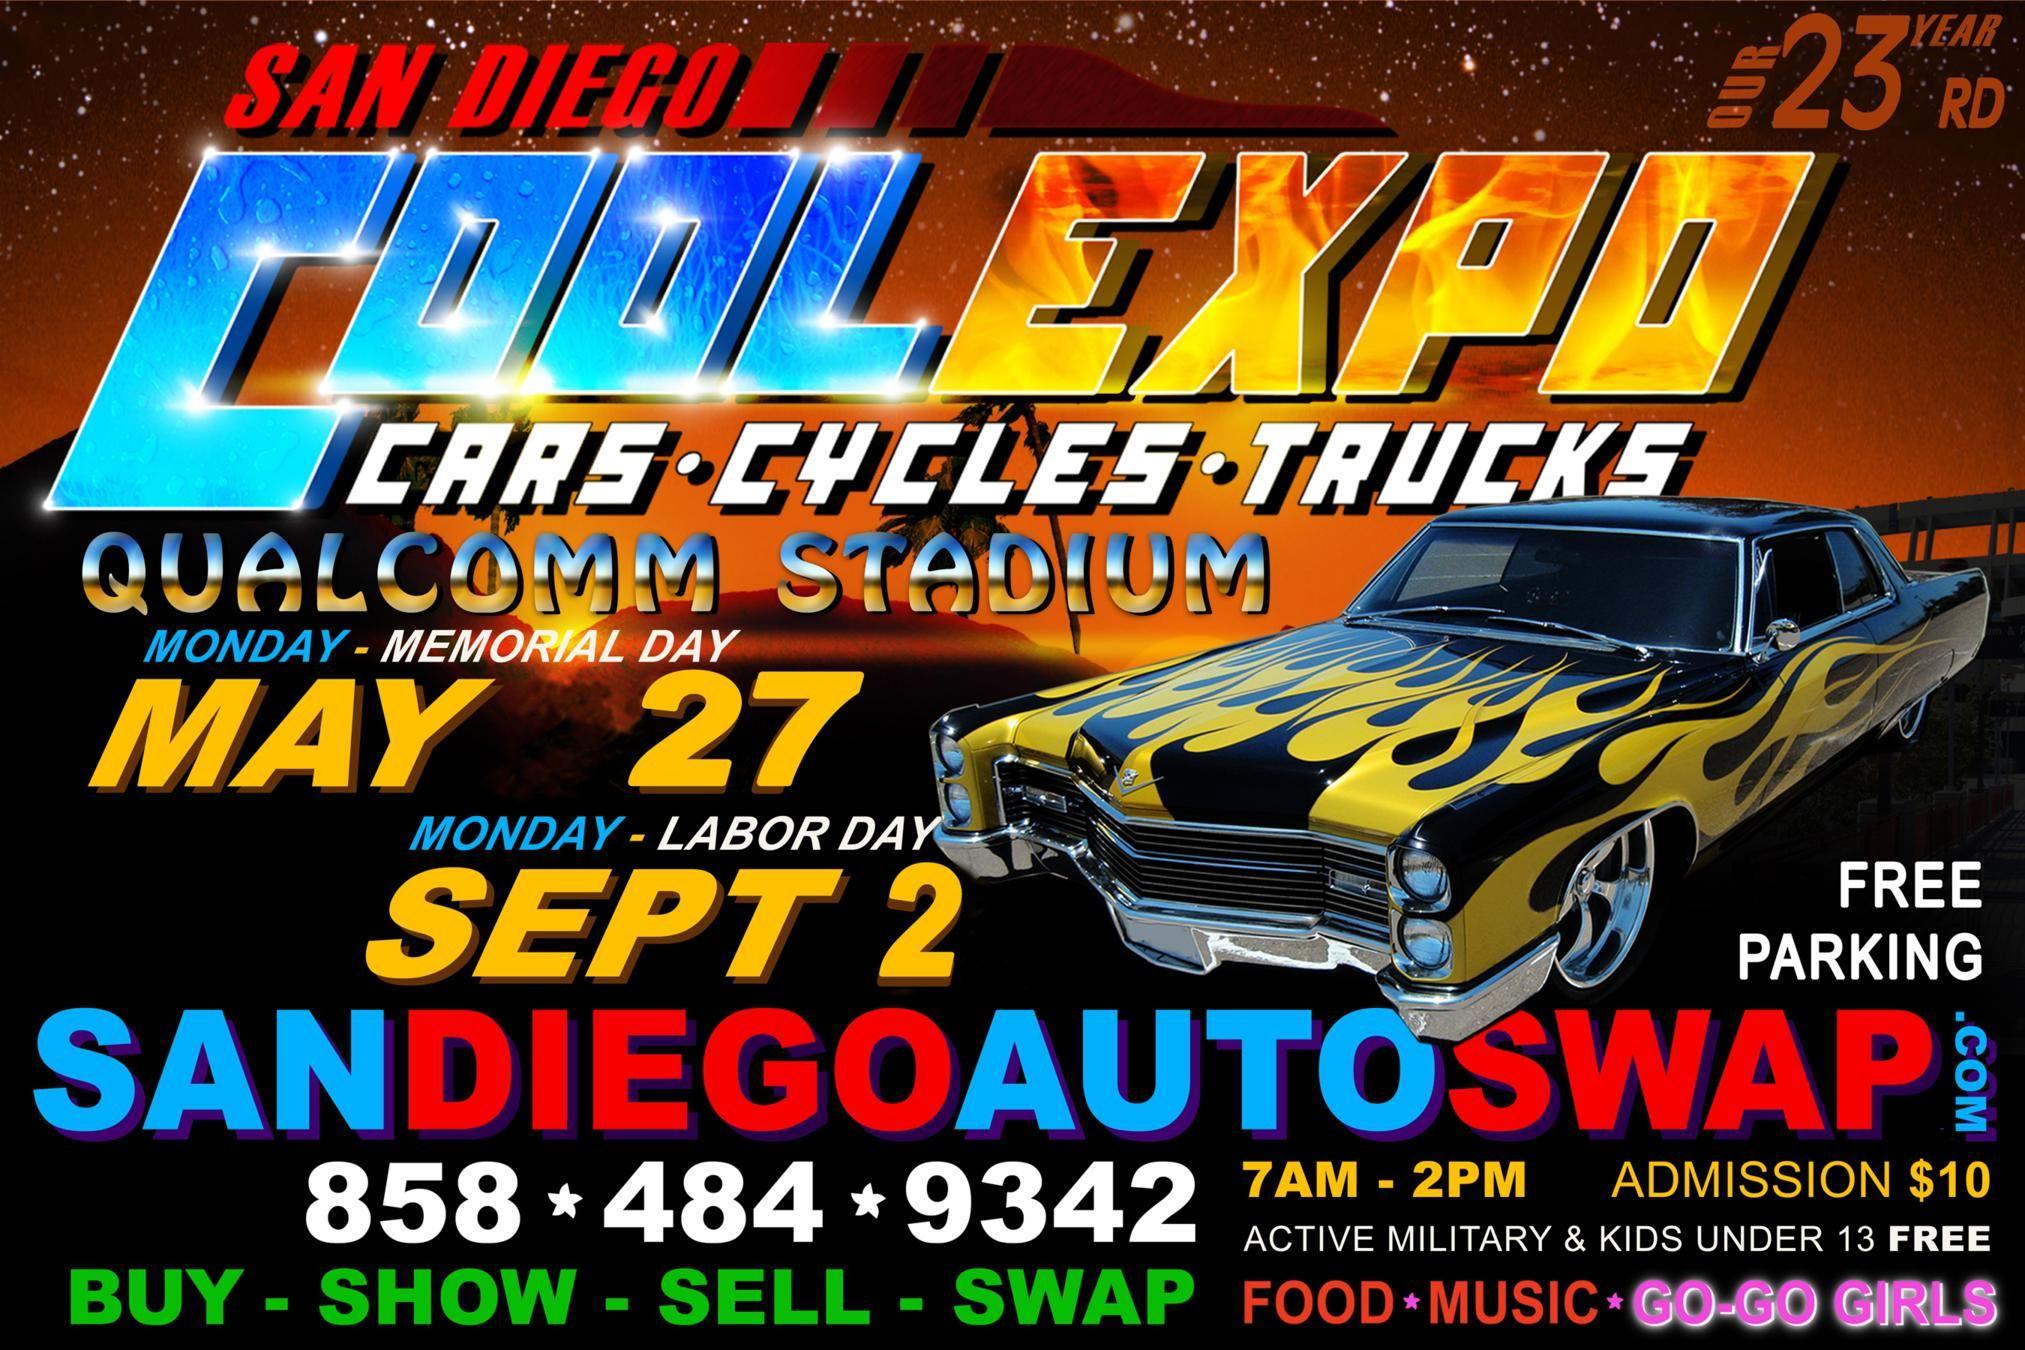 San Diego Cool Car Truck Cycle Expo Qualcomm Stadium Classics